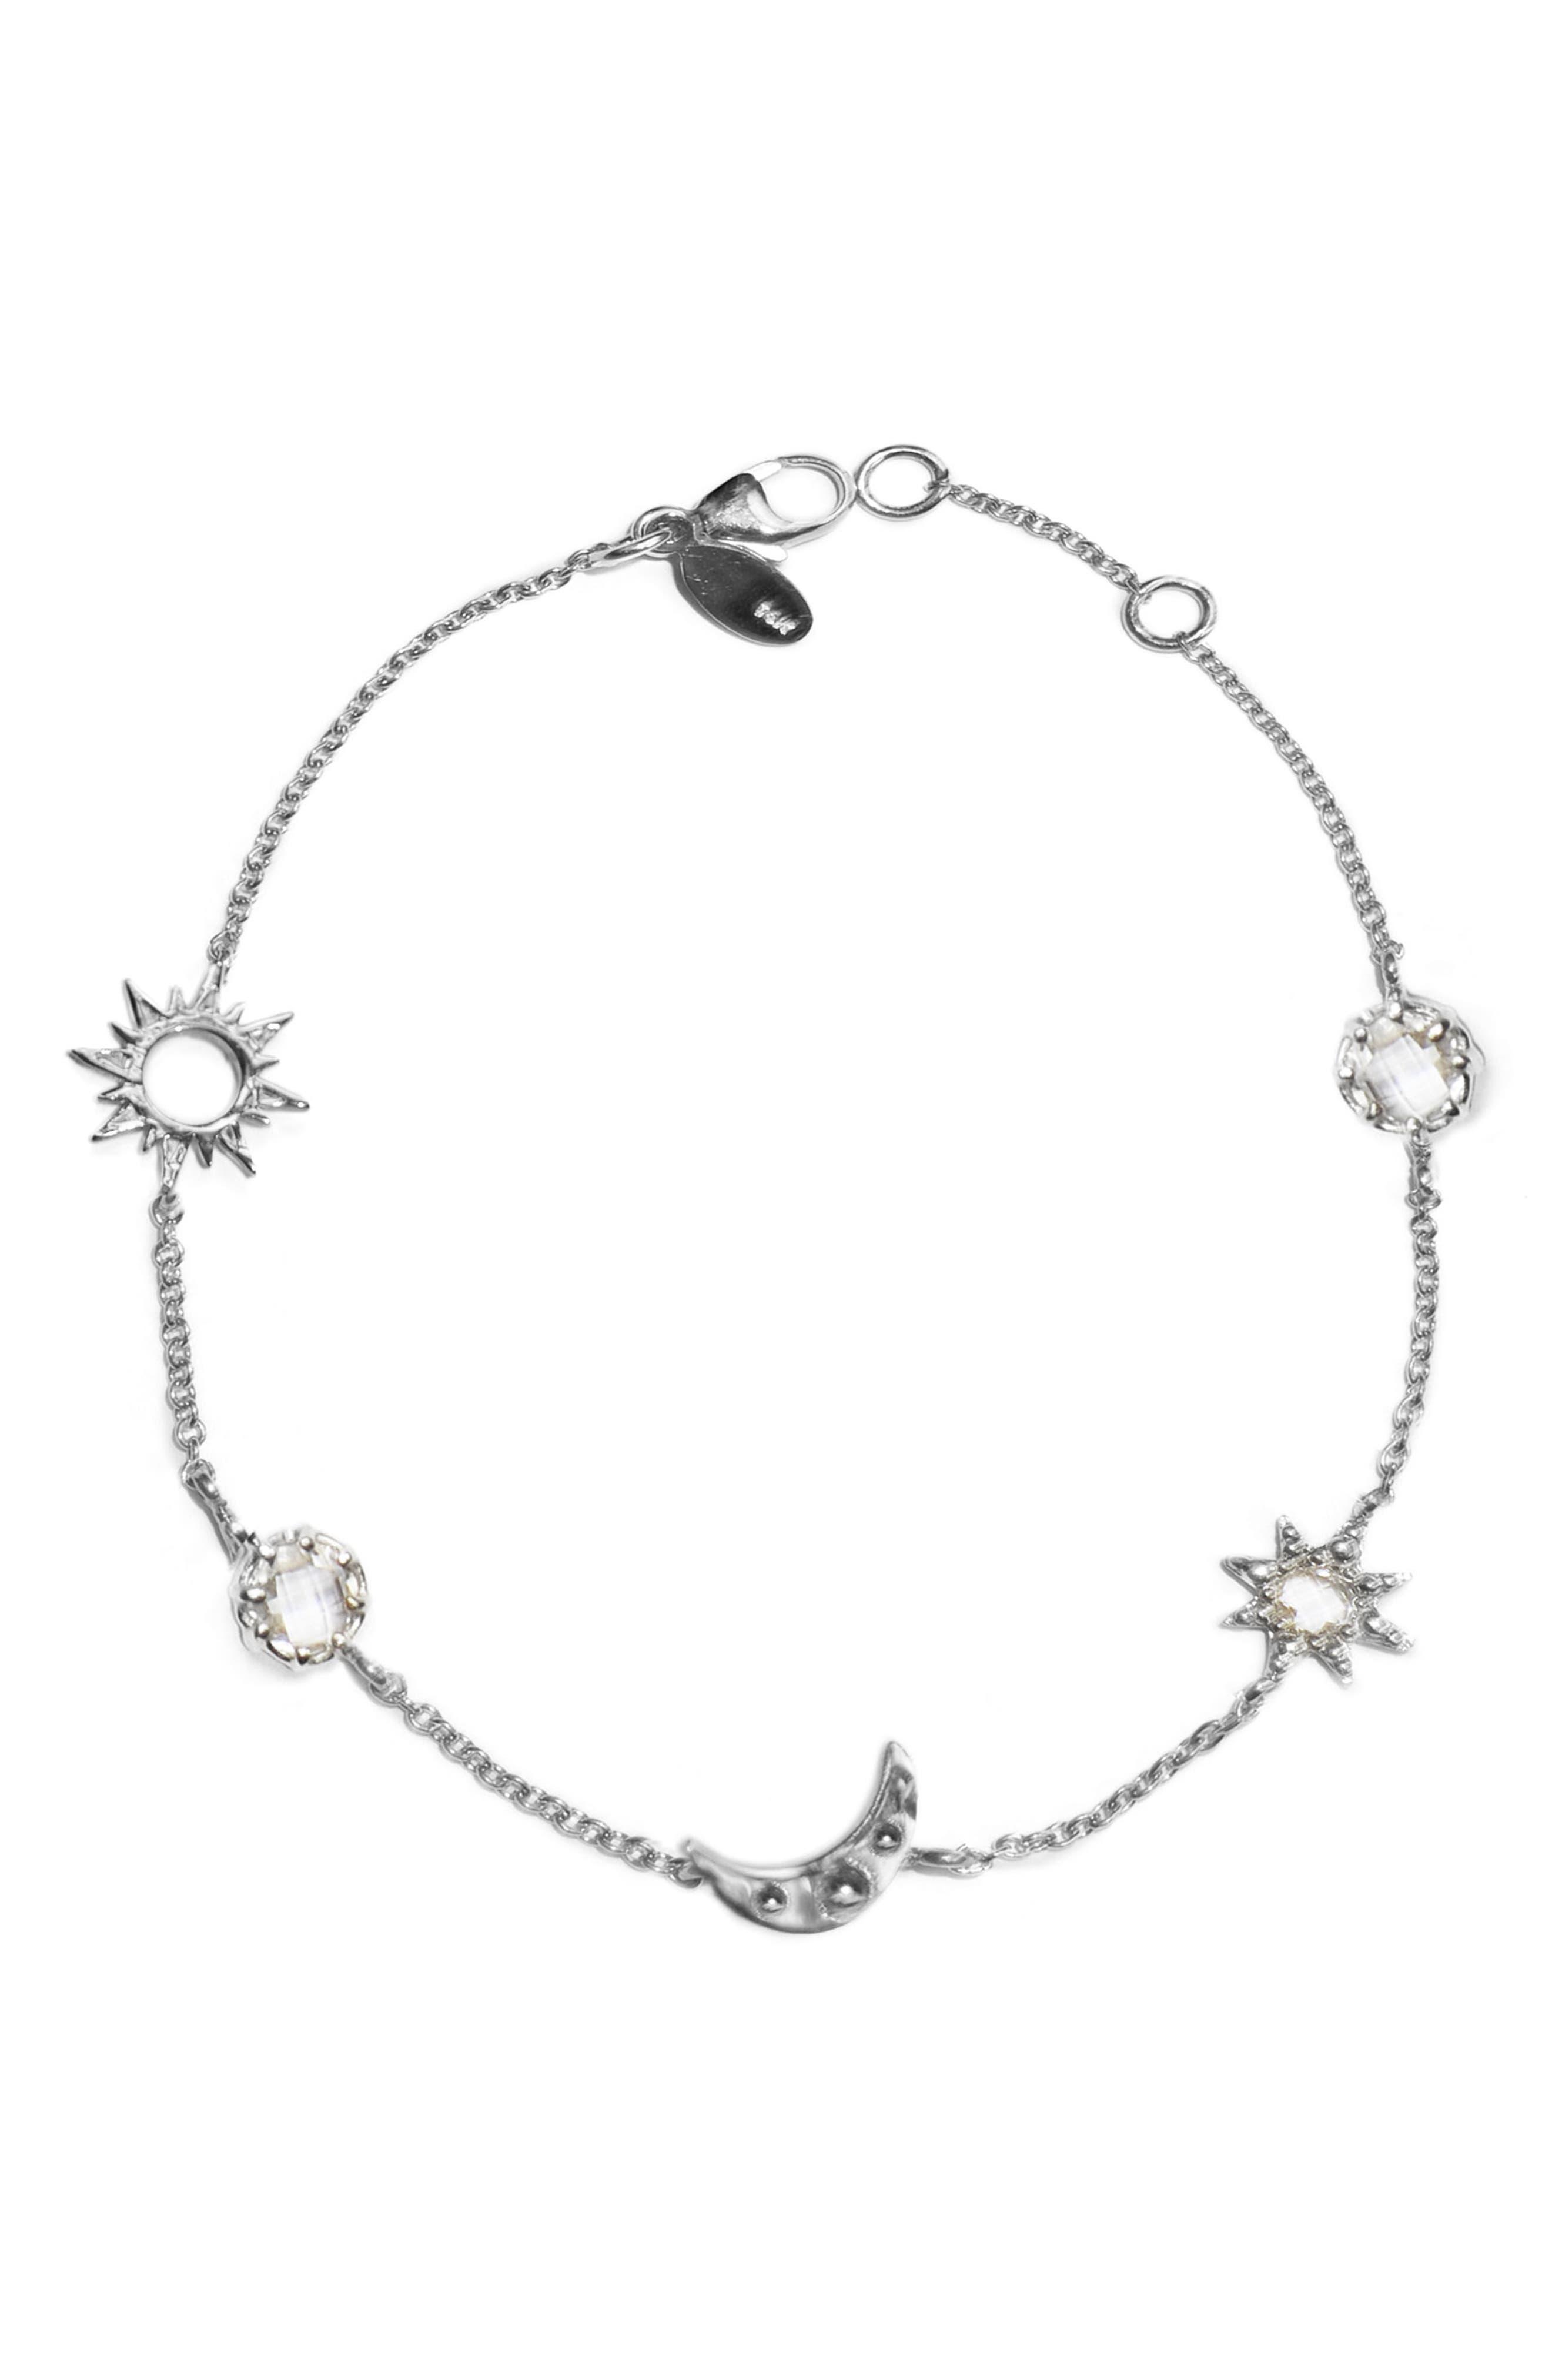 ANZIE, Starburst Celestial White Topaz Charm Bracelet, Main thumbnail 1, color, SILVER